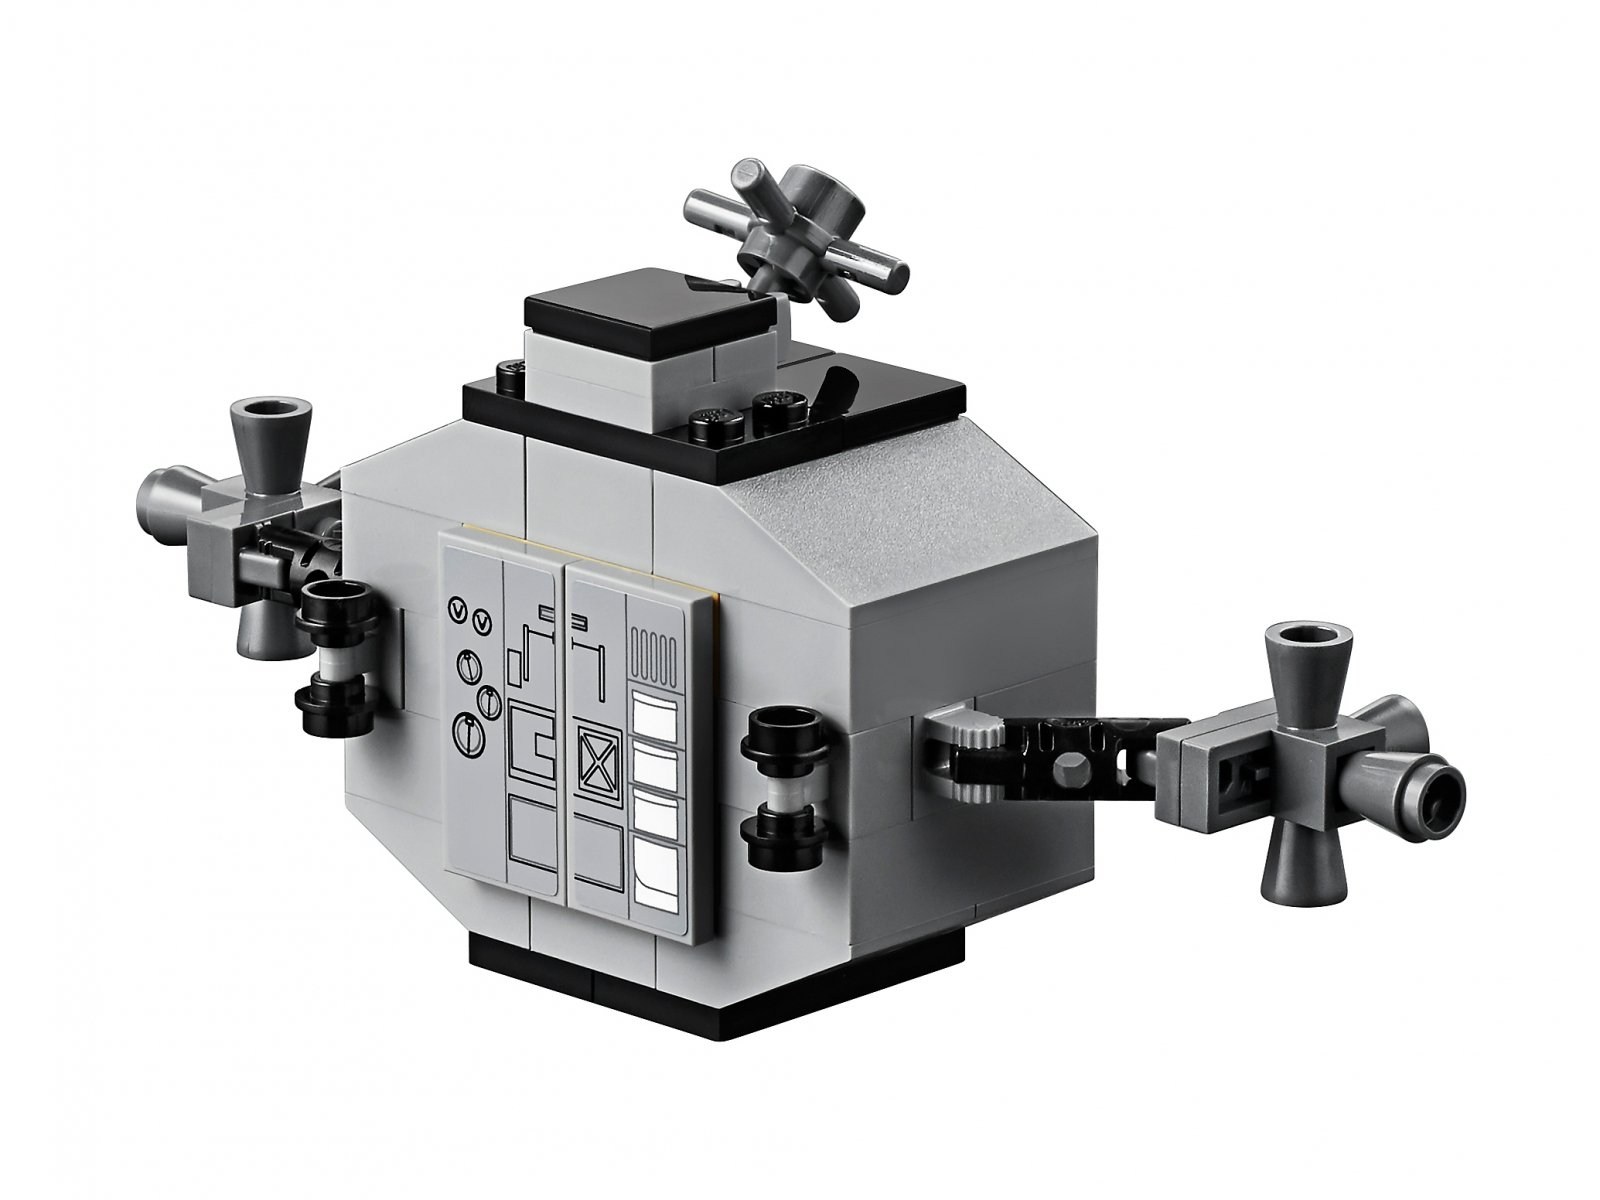 LEGO Creator Expert 10266 Lądownik księżycowy Apollo 11 NASA